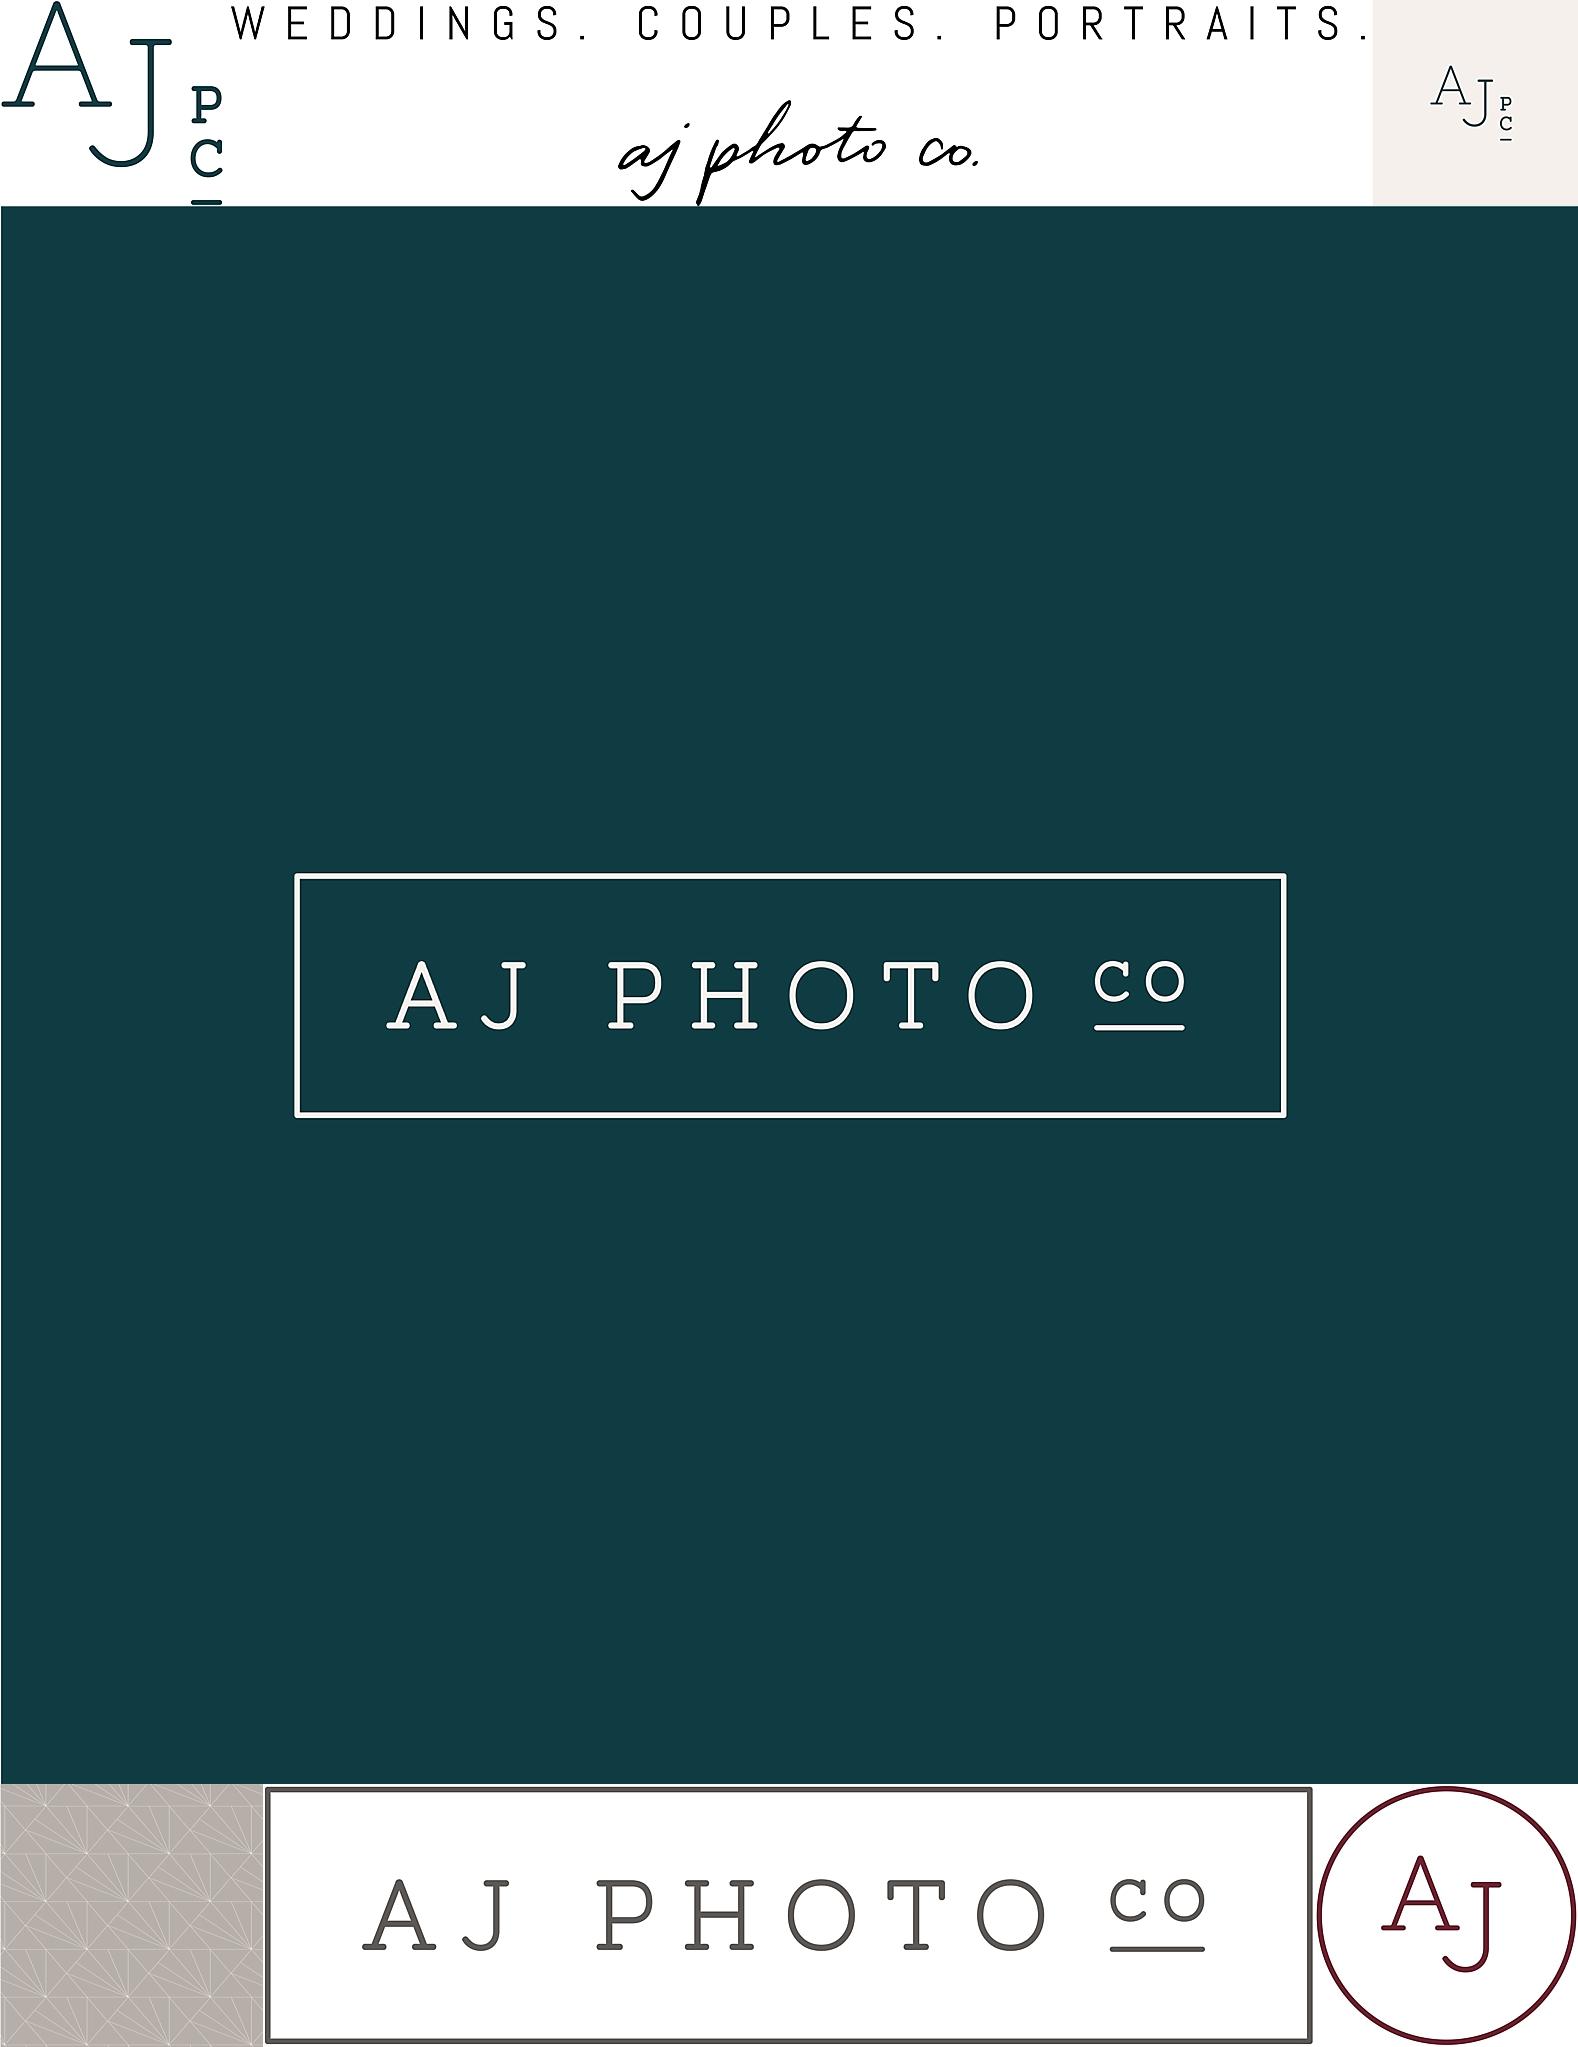 Logos and branding for AJ Photo Company, photographer in Sun Prairie, WI